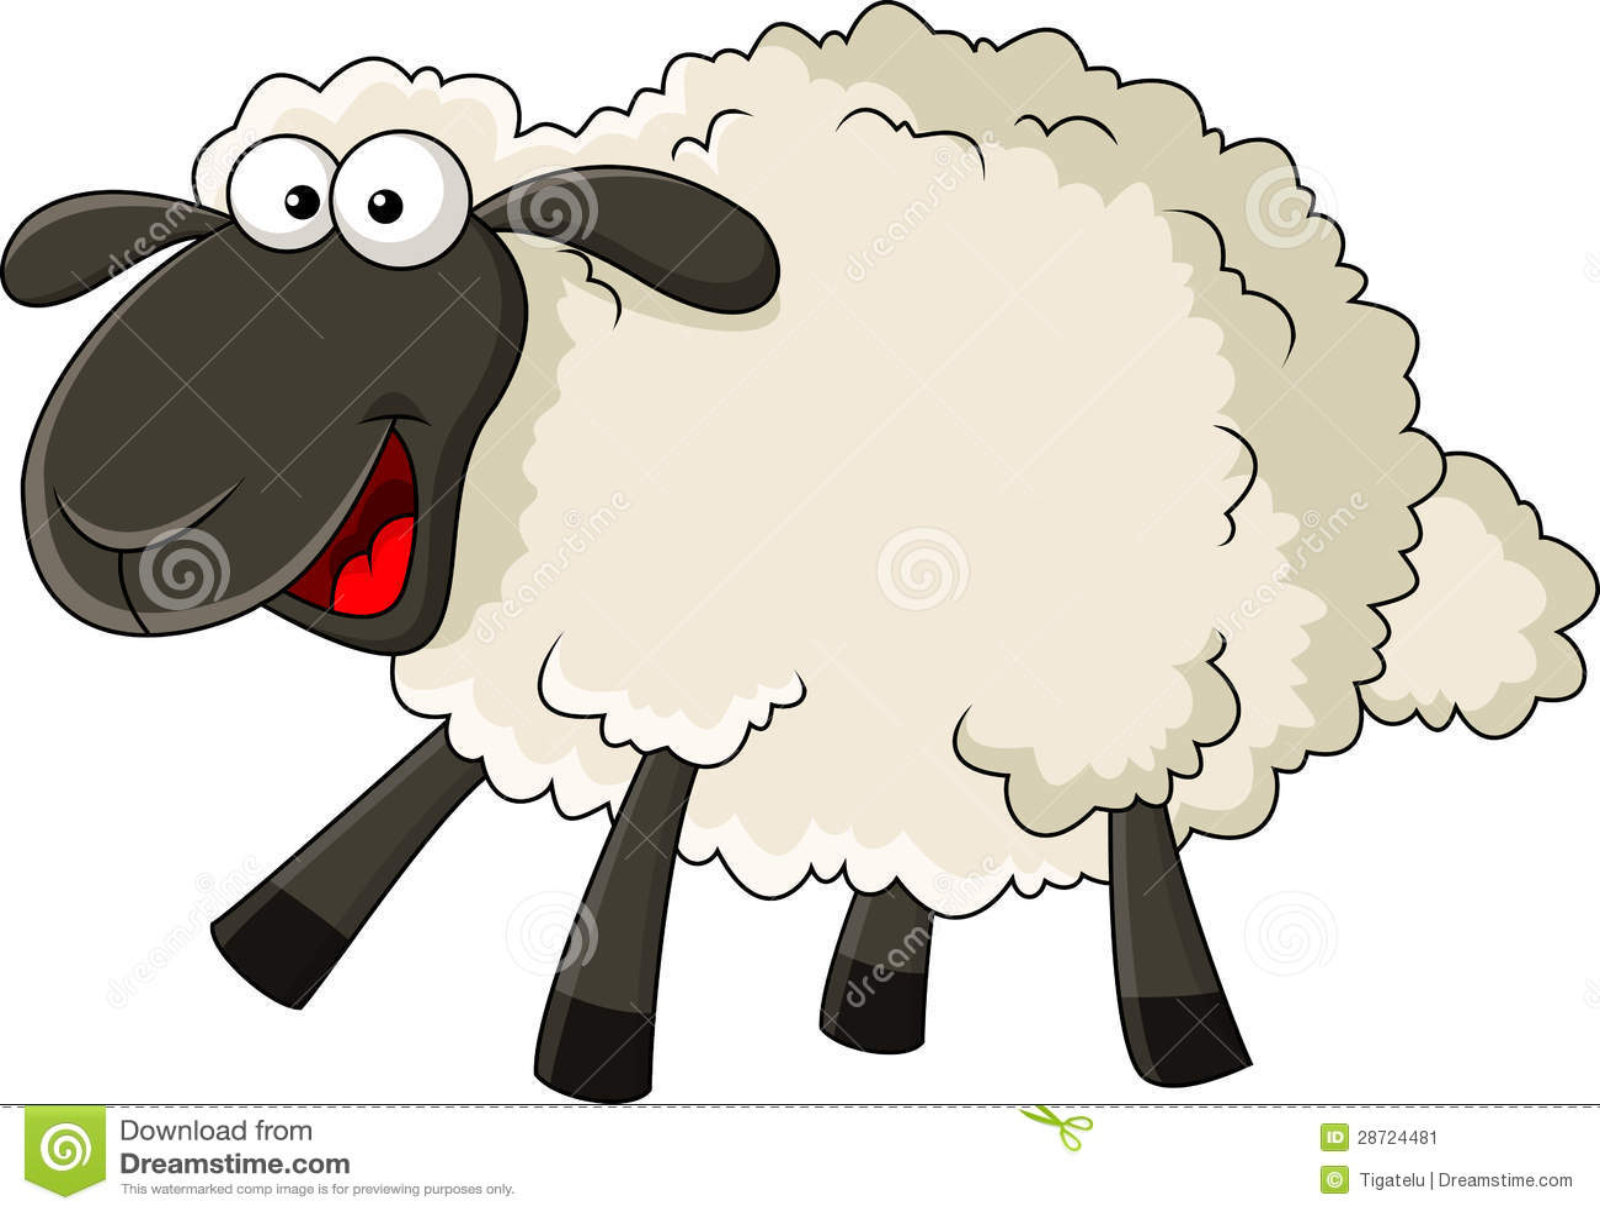 funny sheep cartoon stock image image 28724481 angry eyes images clip art Sad Eyes Clip Art